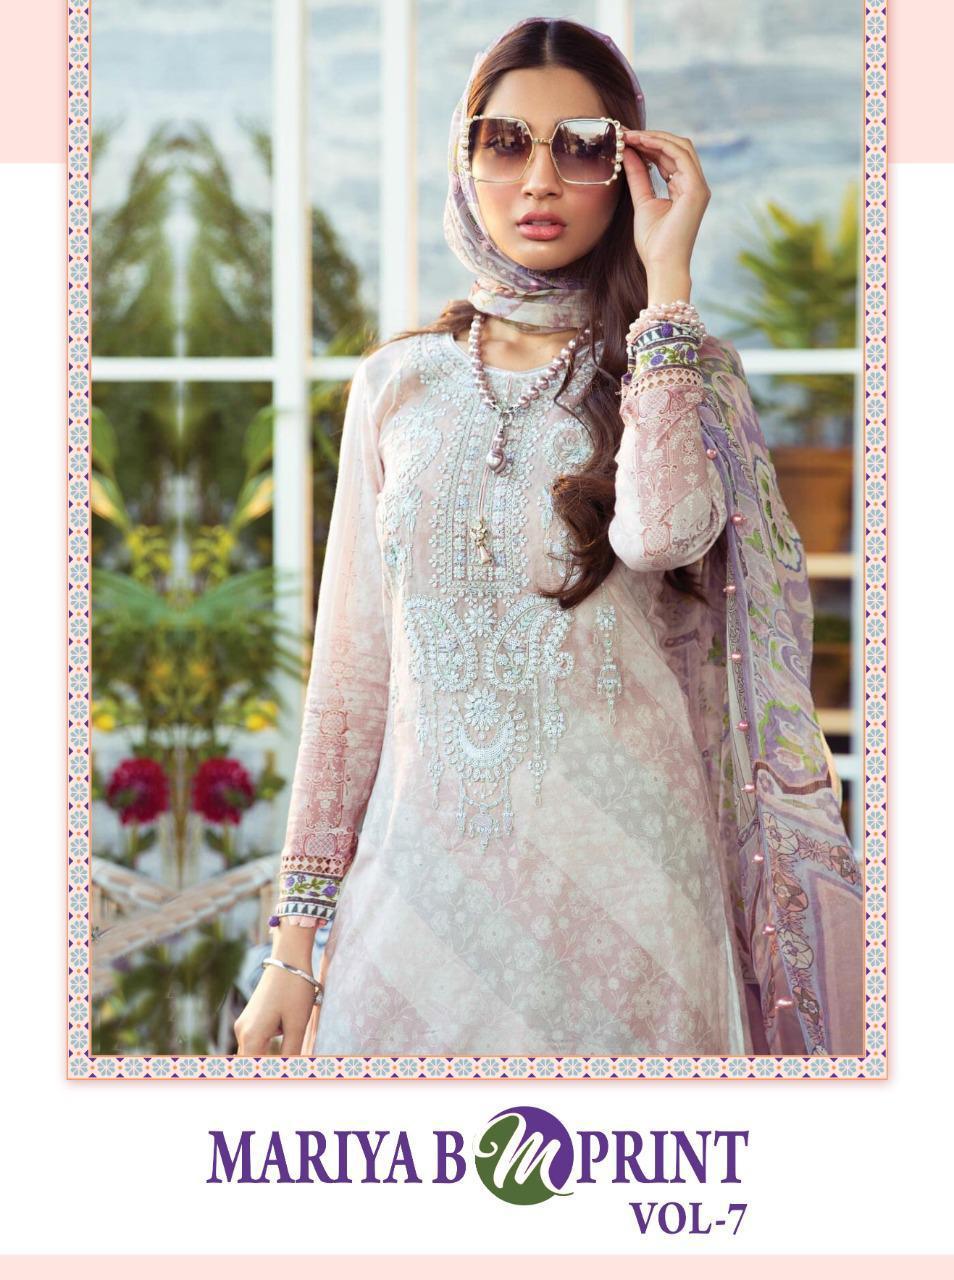 Shree Fabs Mariya B MPrint Vol 7 Salwar Suit Wholesale Catalog 8 Pcs 1 - Shree Fabs Mariya B MPrint Vol 7 Salwar Suit Wholesale Catalog 8 Pcs